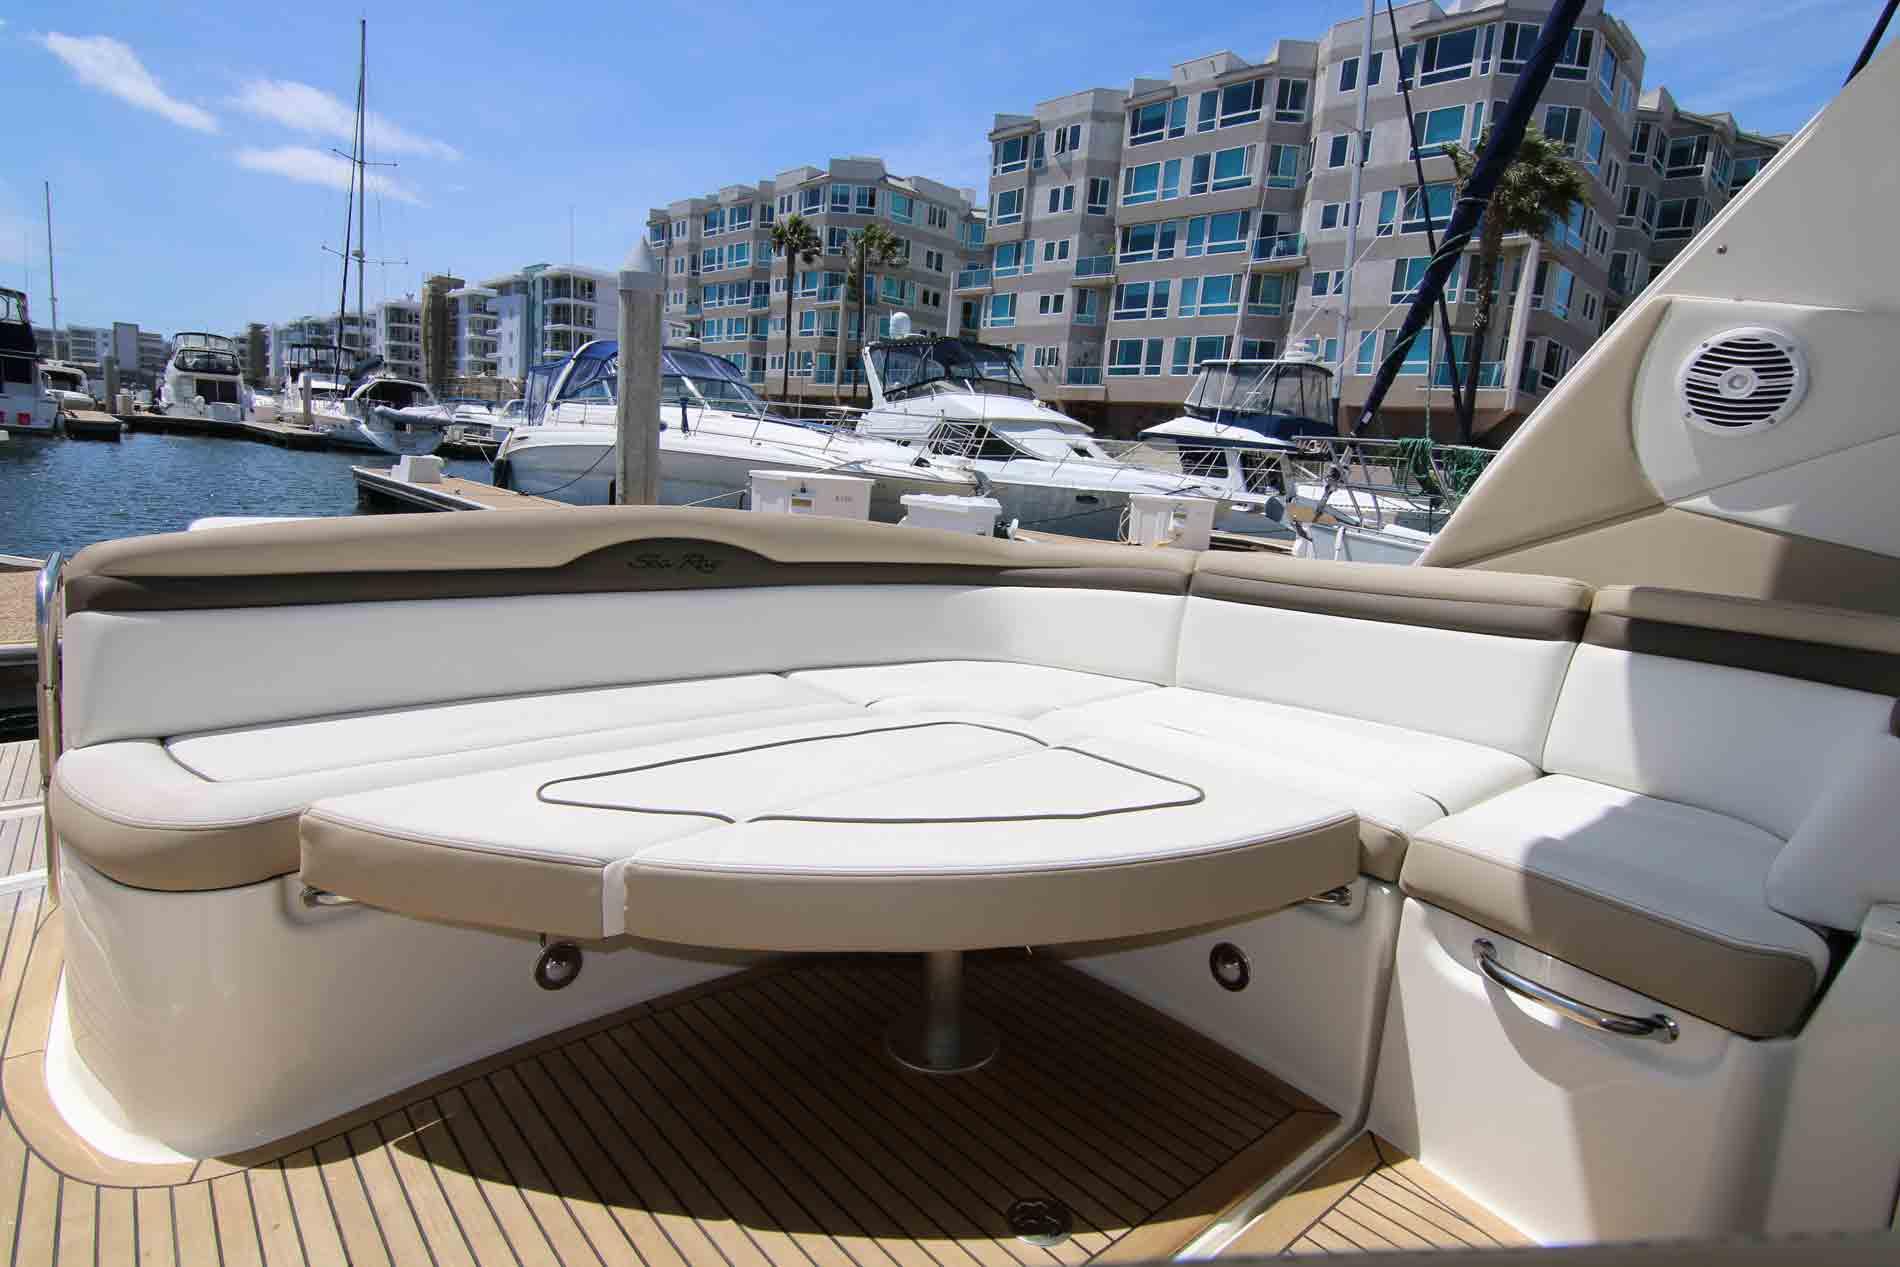 marina-del-rey-boat-rental-deck-area